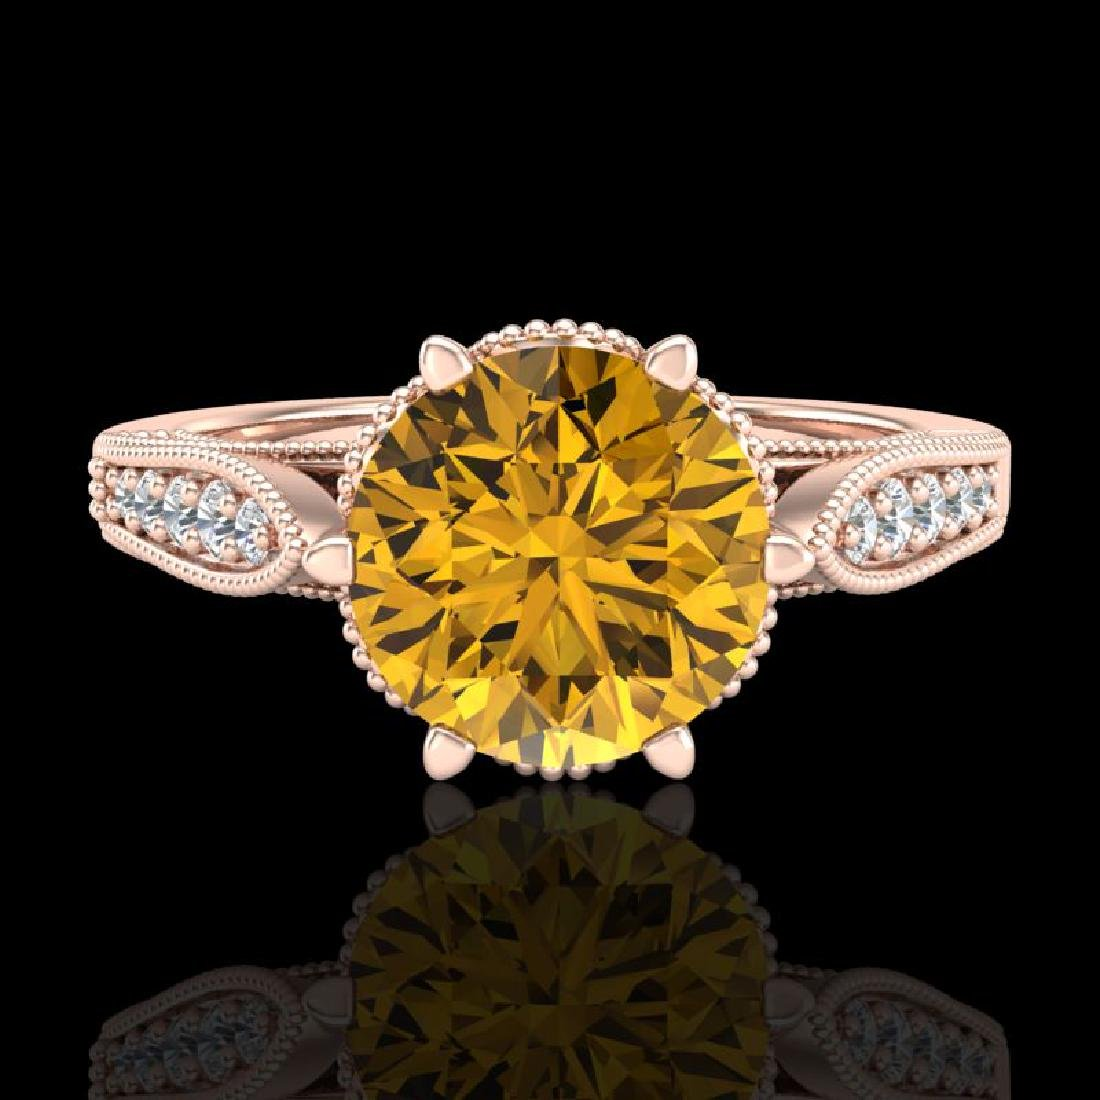 2.2 CTW Intense Fancy Yellow Diamond Engagement Art - 2